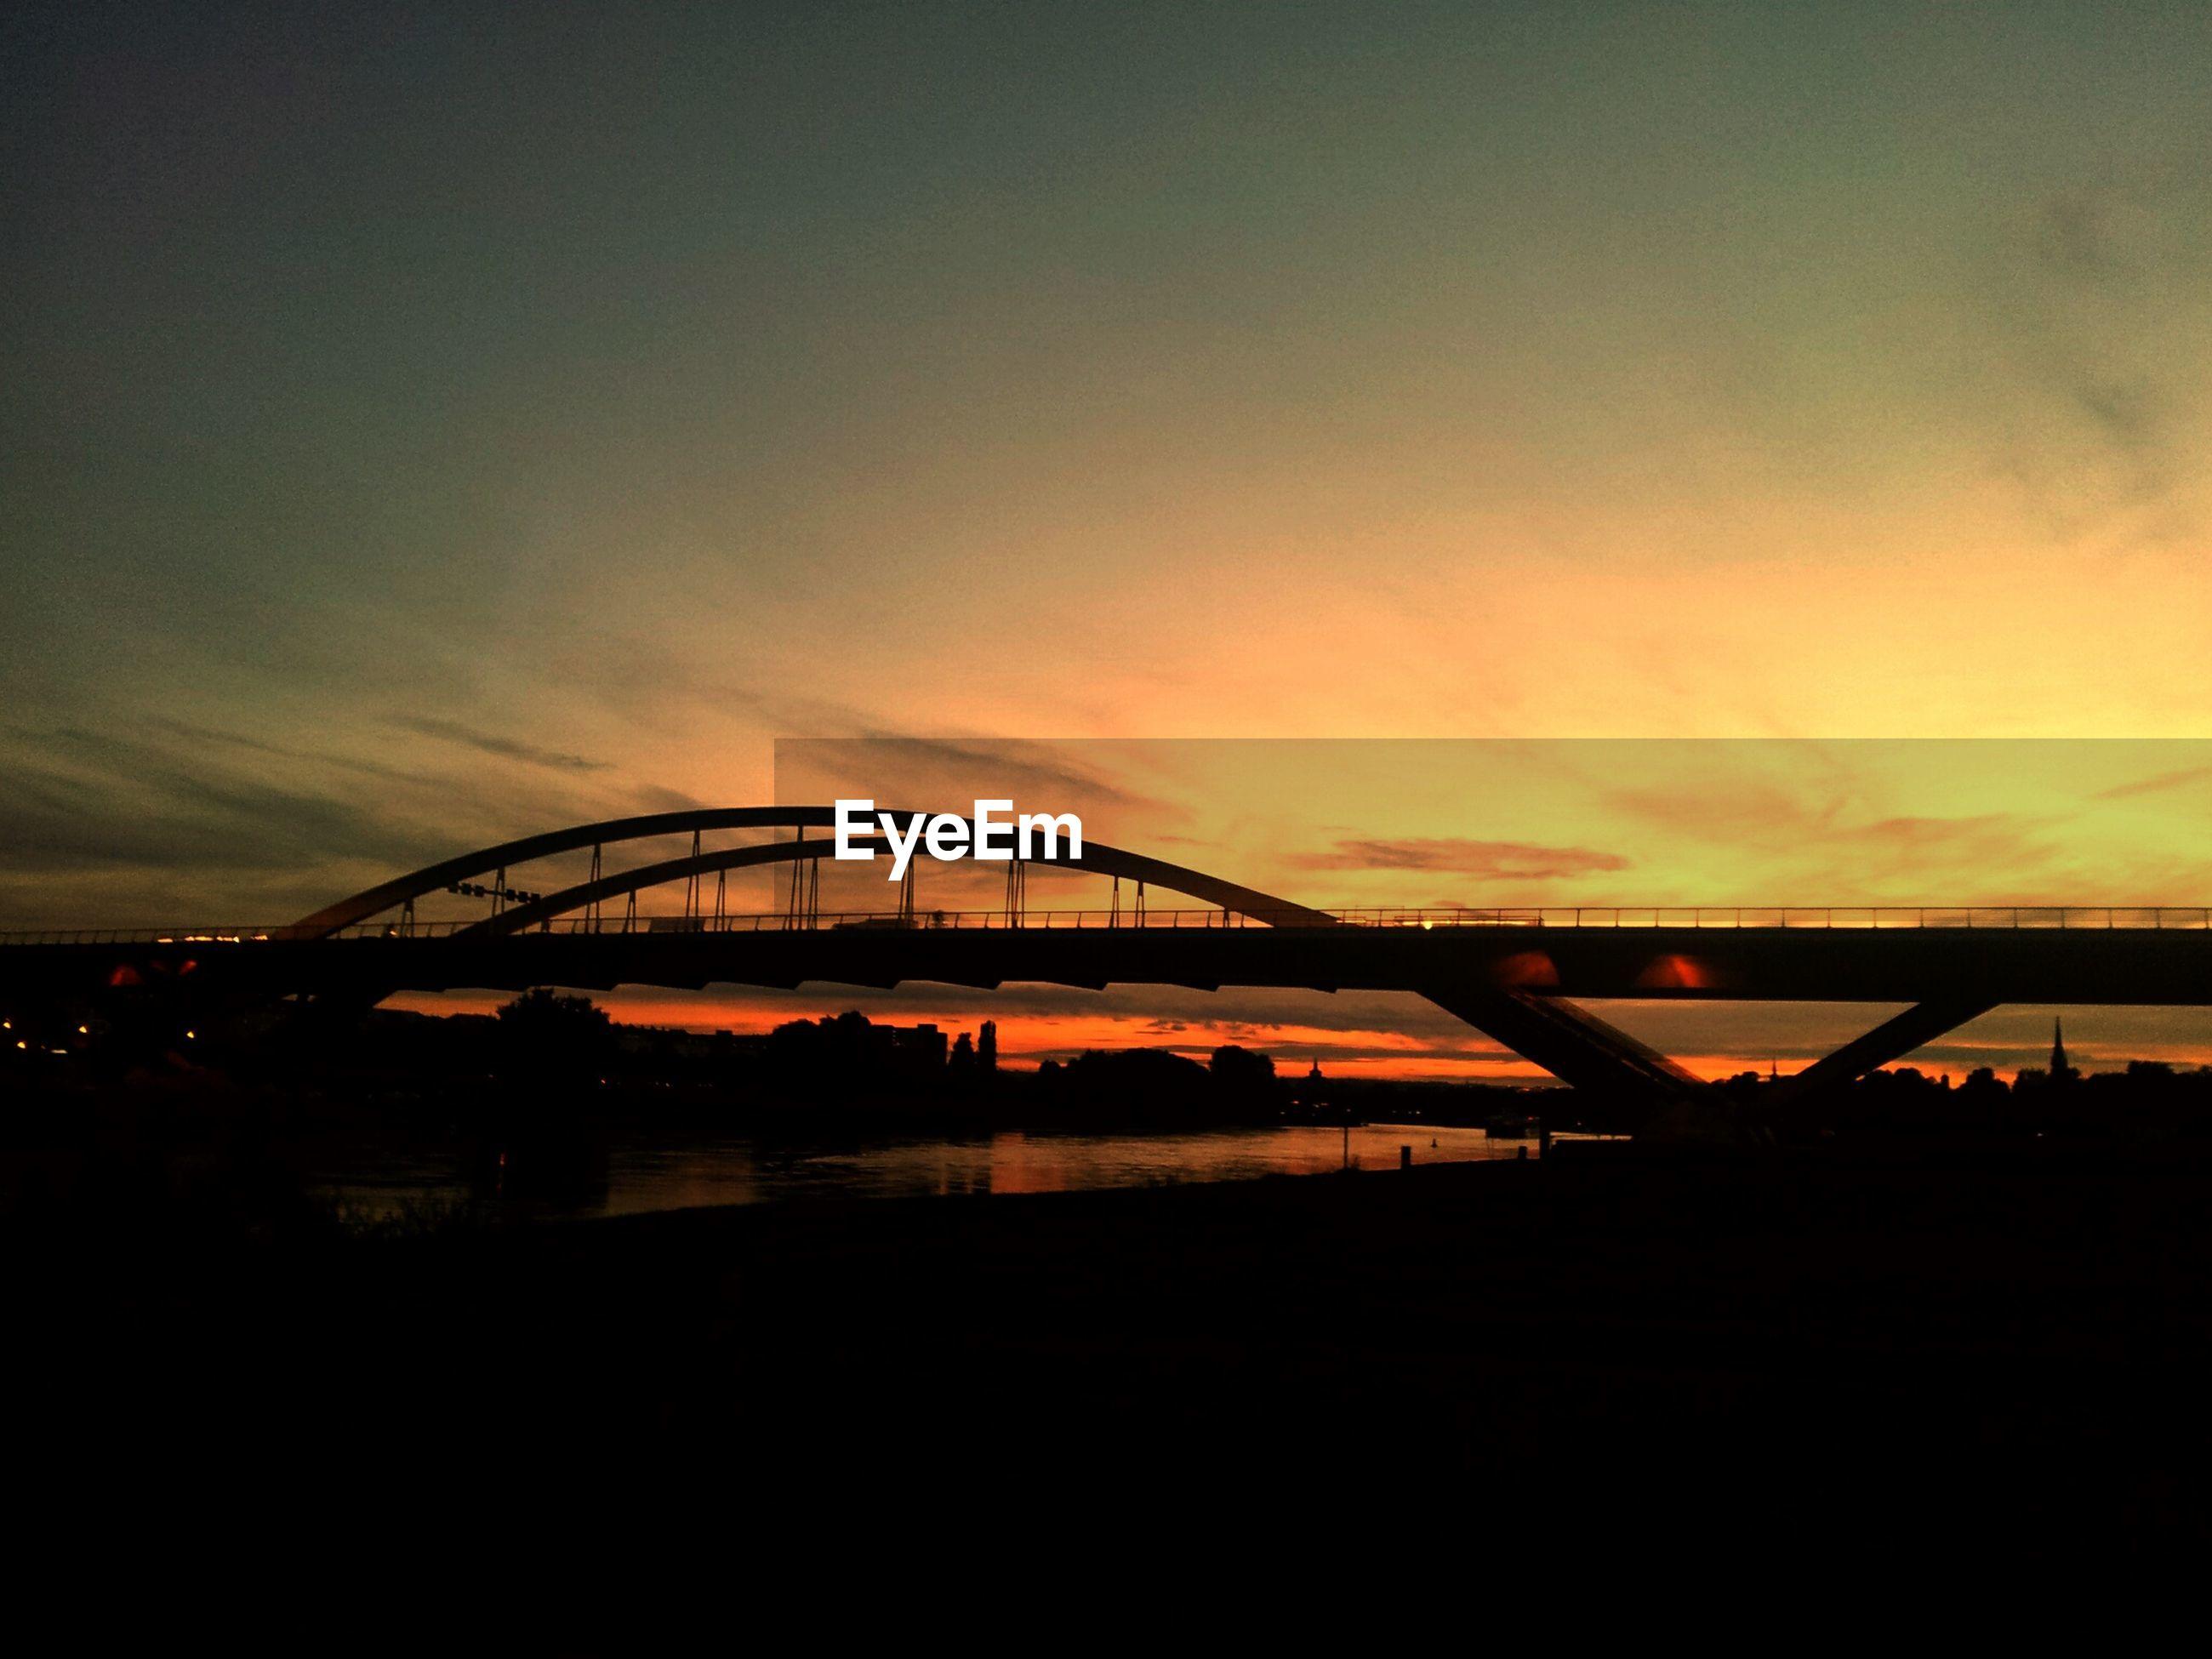 sunset, silhouette, connection, sky, bridge - man made structure, orange color, built structure, architecture, cloud - sky, bridge, engineering, river, sun, nature, scenics, dusk, cloud, tranquility, beauty in nature, no people